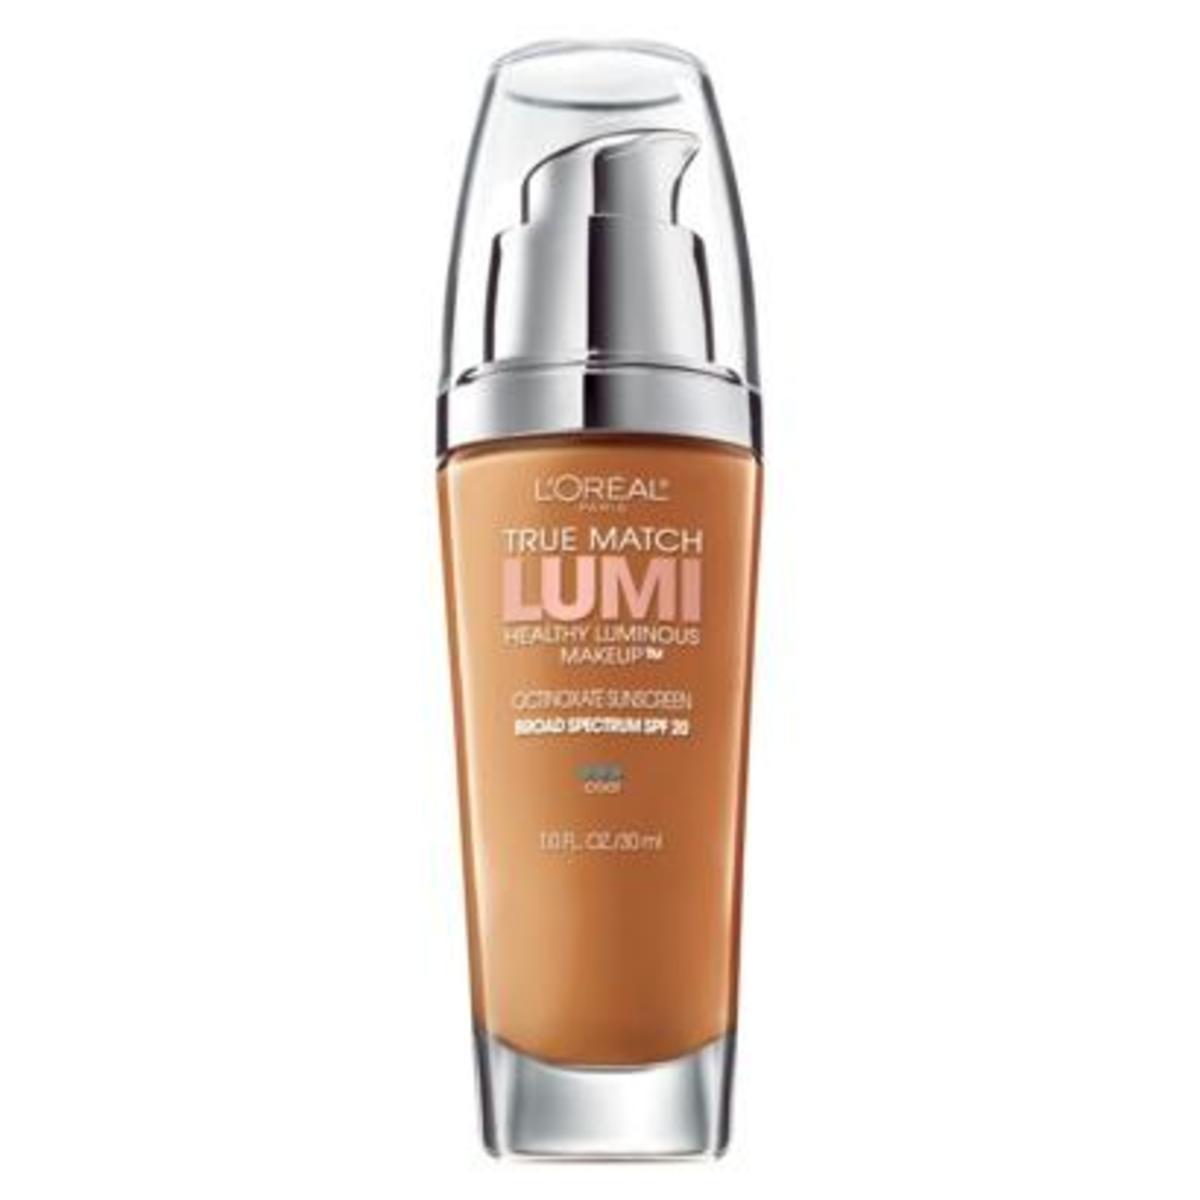 L'Oreal Paris True Match Lumi Foundation